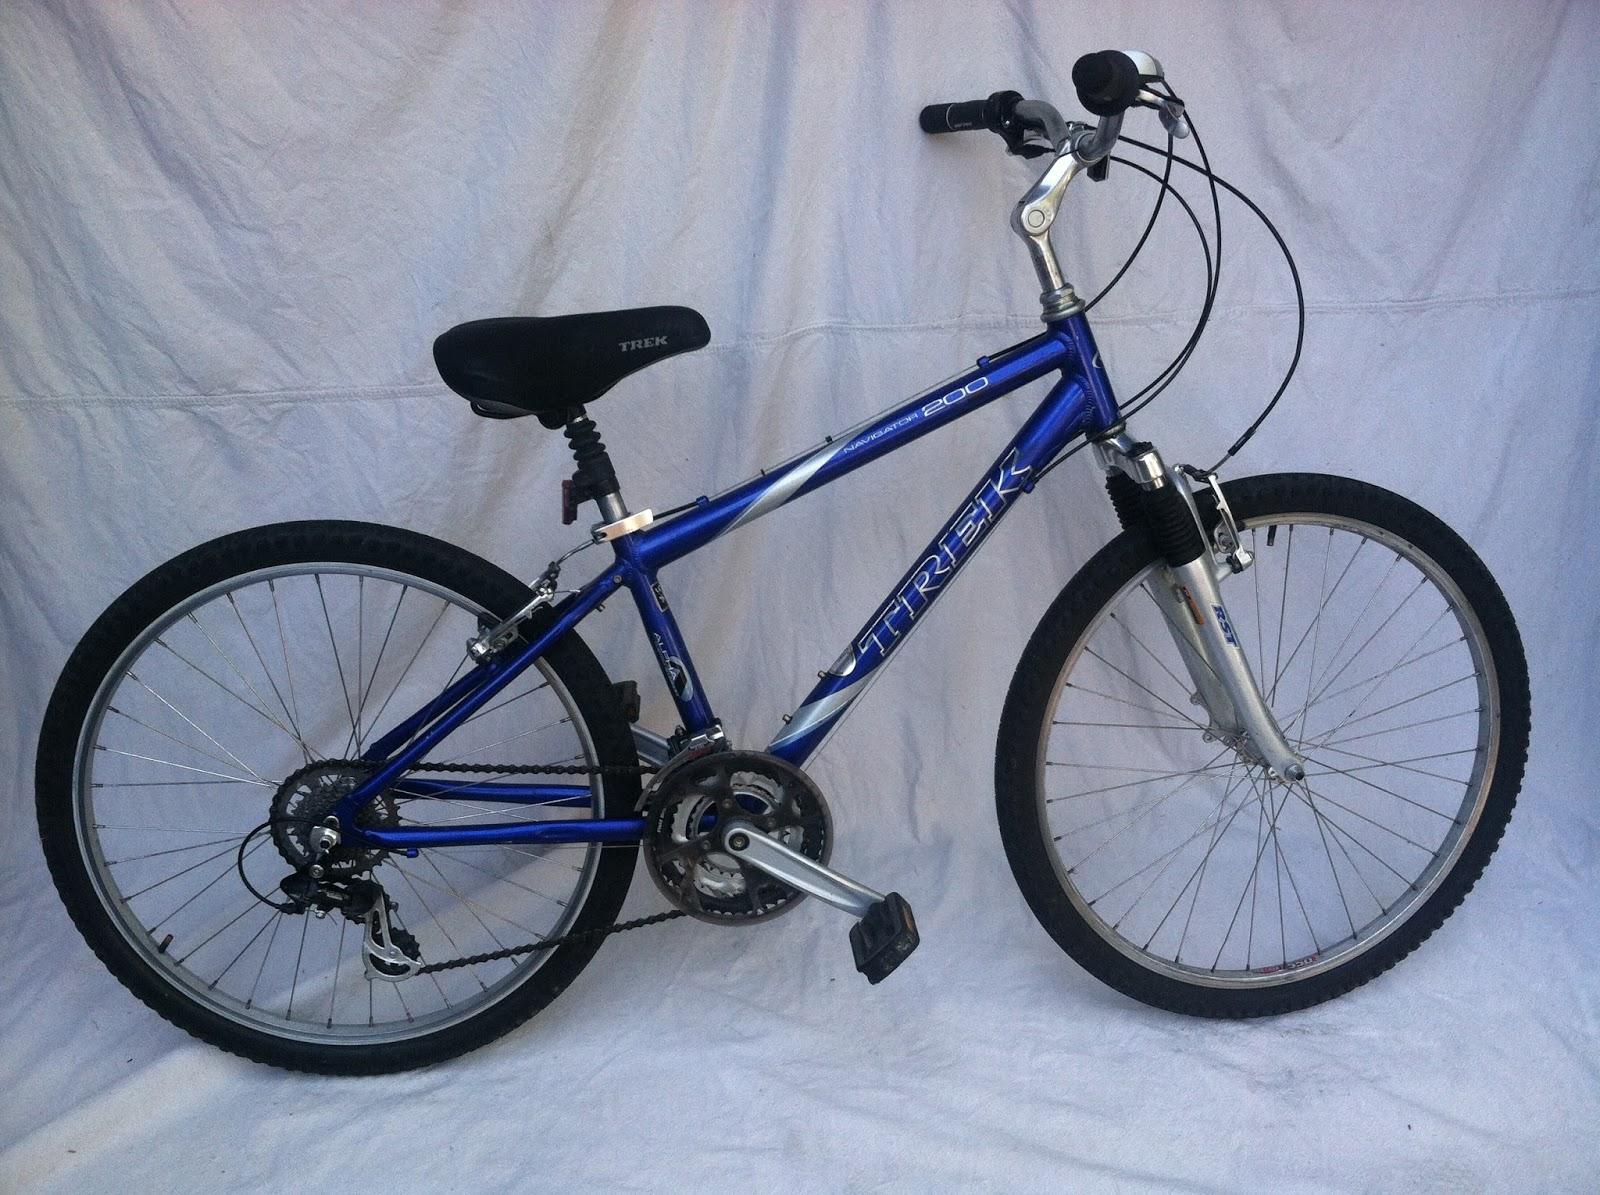 2002 Trek Navigator 200 Hybrid Comfort Bike 14 5 SOLD | The